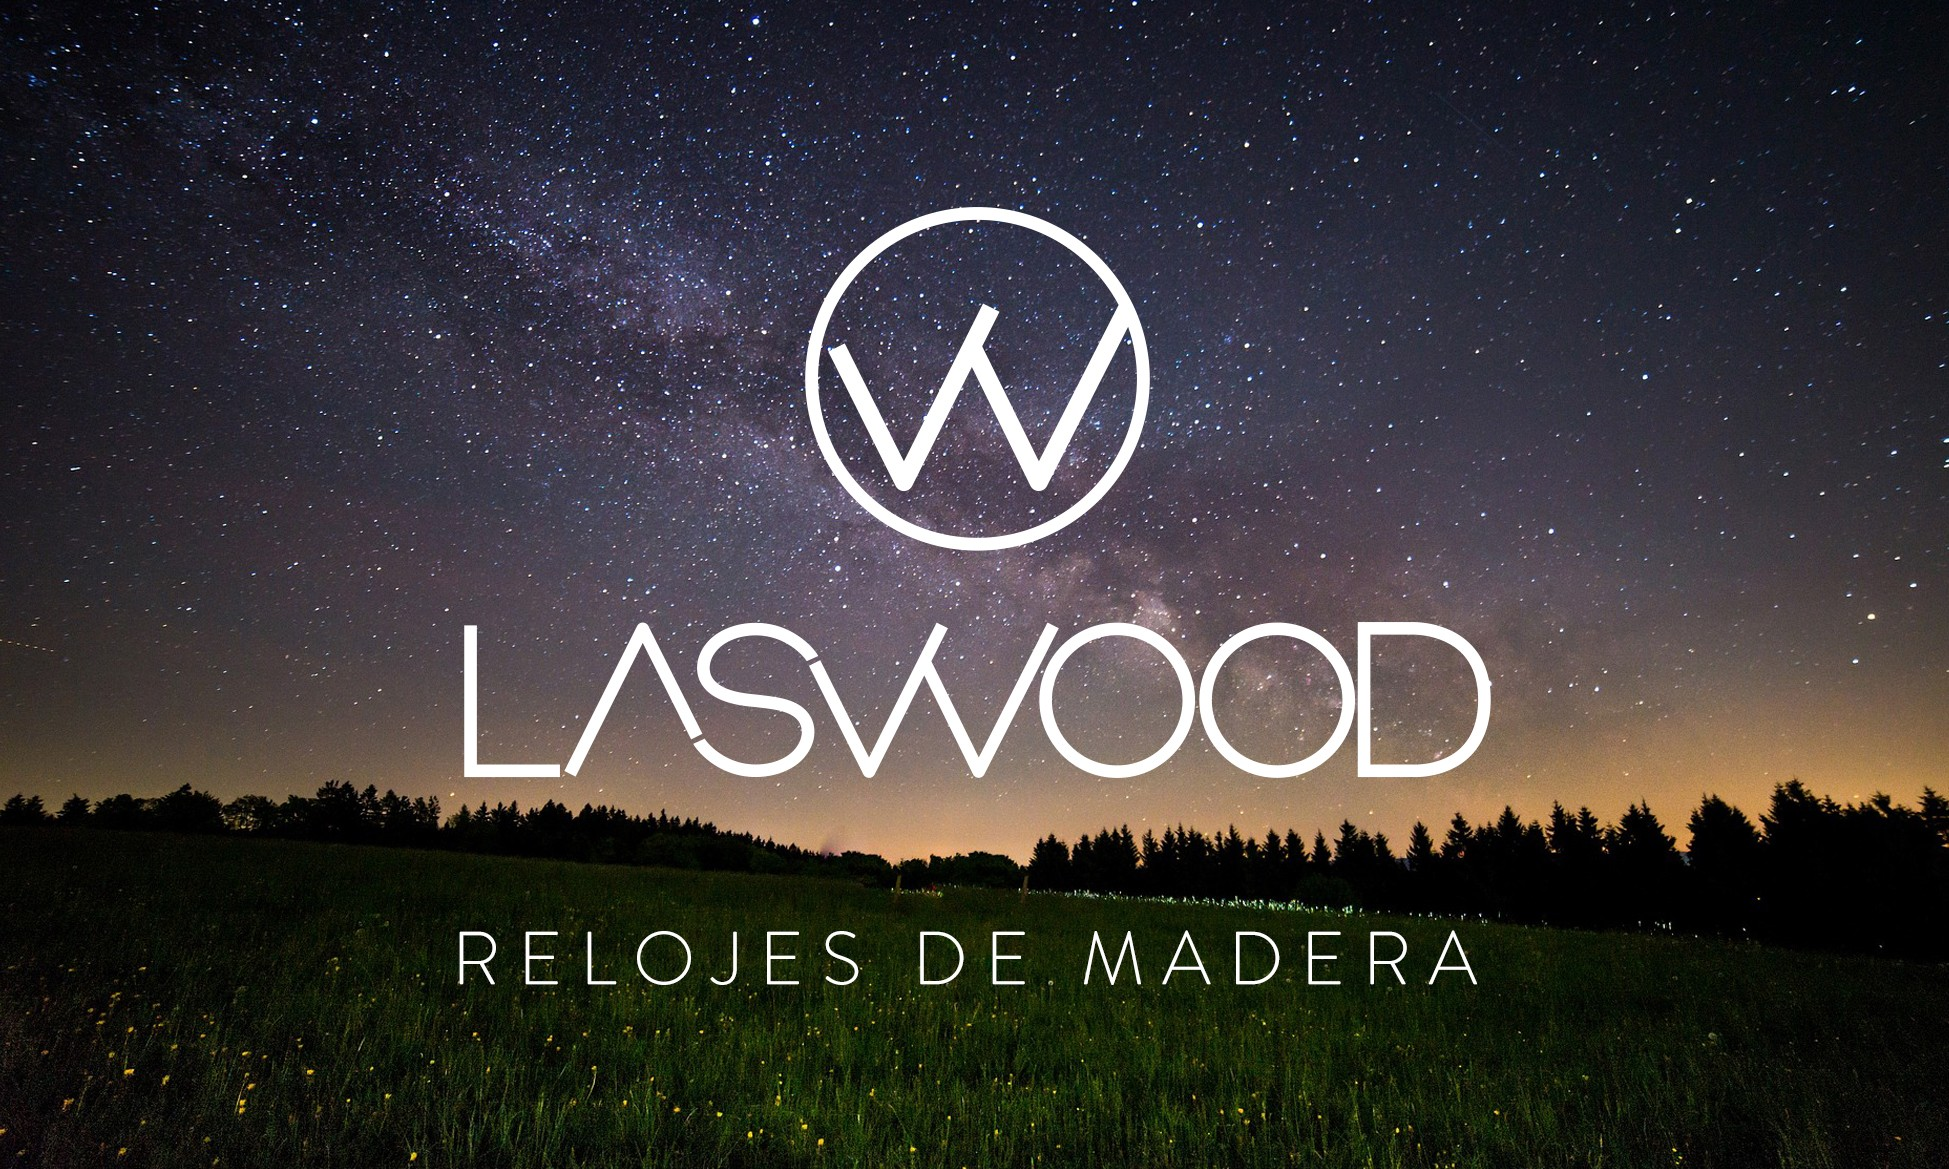 Relojes Relojes MaderaLinkedin De Laswood De Laswood Relojes Laswood MaderaLinkedin DH2EYe9WI